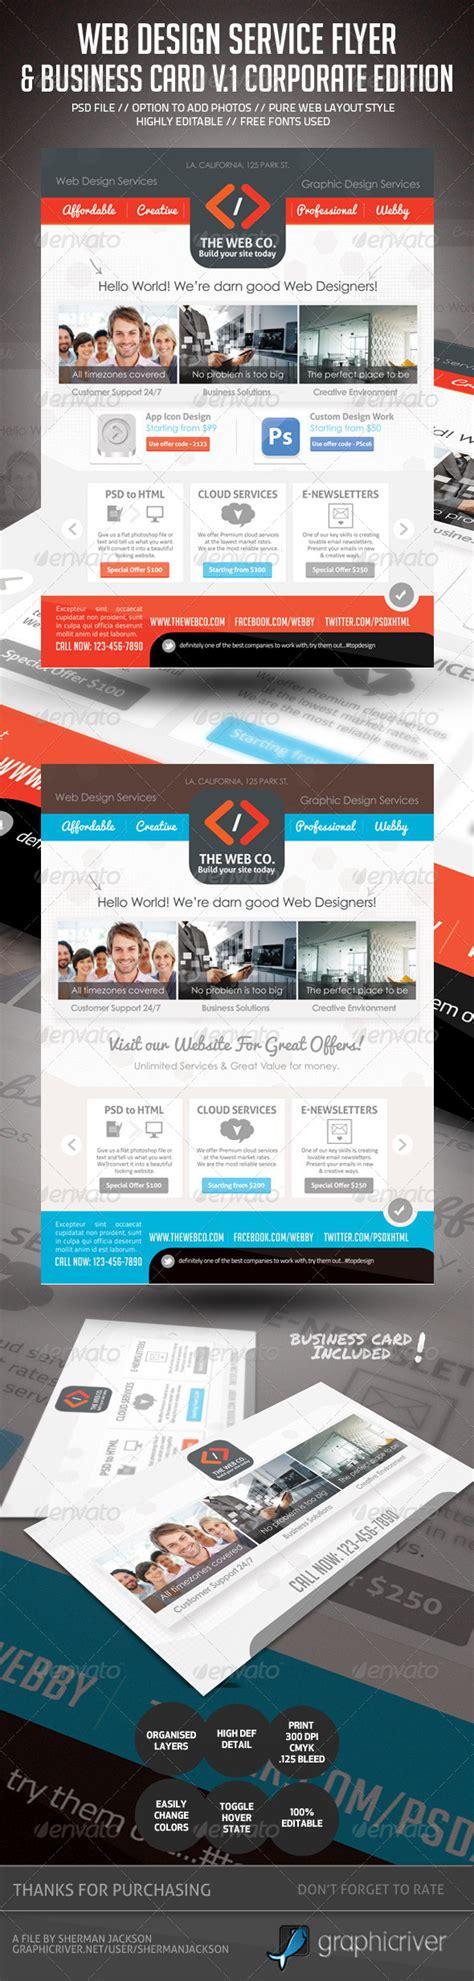 http graphicriver net item funeral service business card template 10998645 print template graphicriver web design service set 1